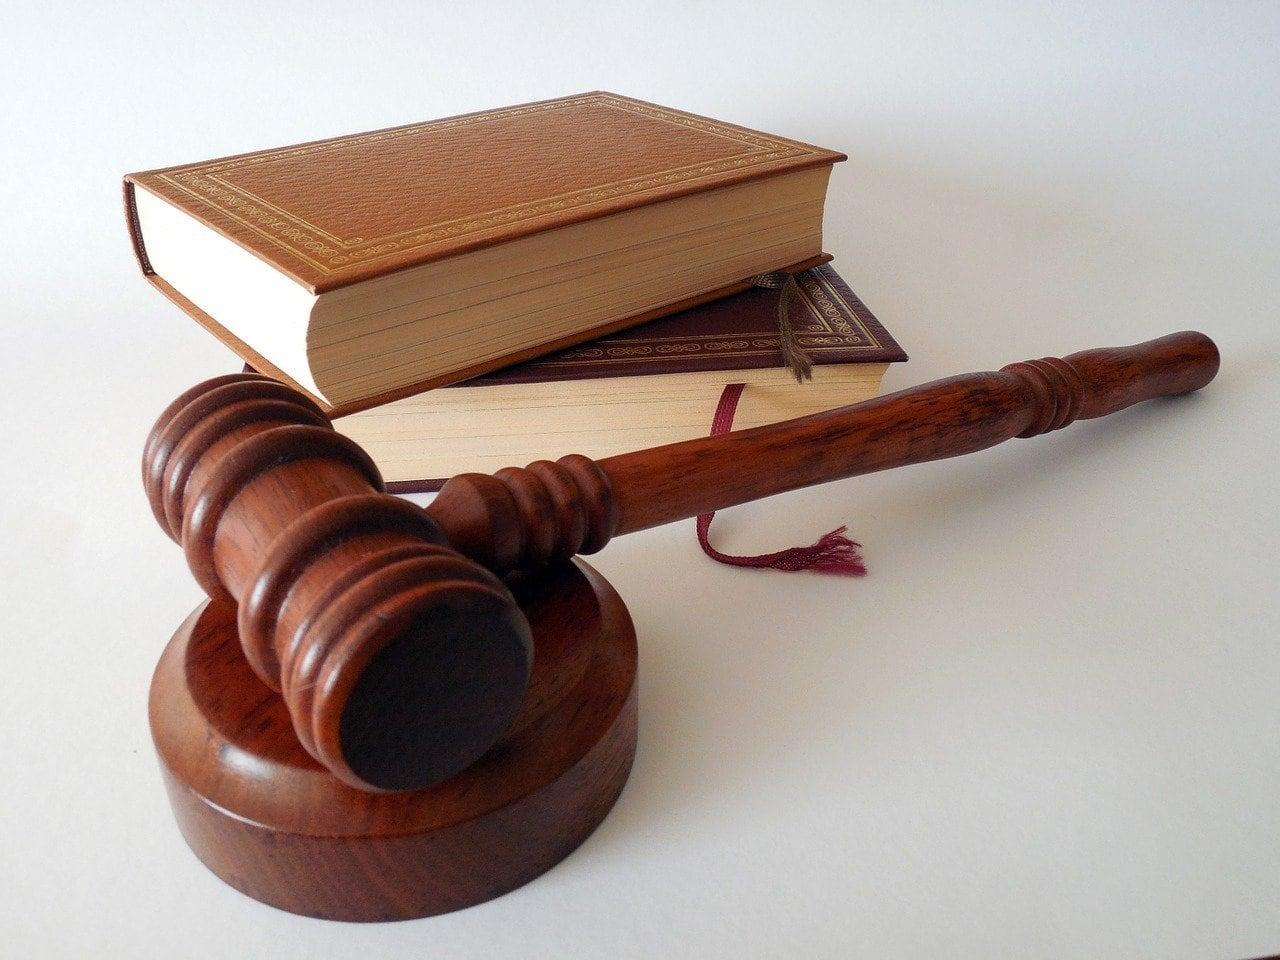 Hukum - Jurusan Favorit di UNSRI Palembang dan Paling Banyak Peminat Universitas Sriwijaya